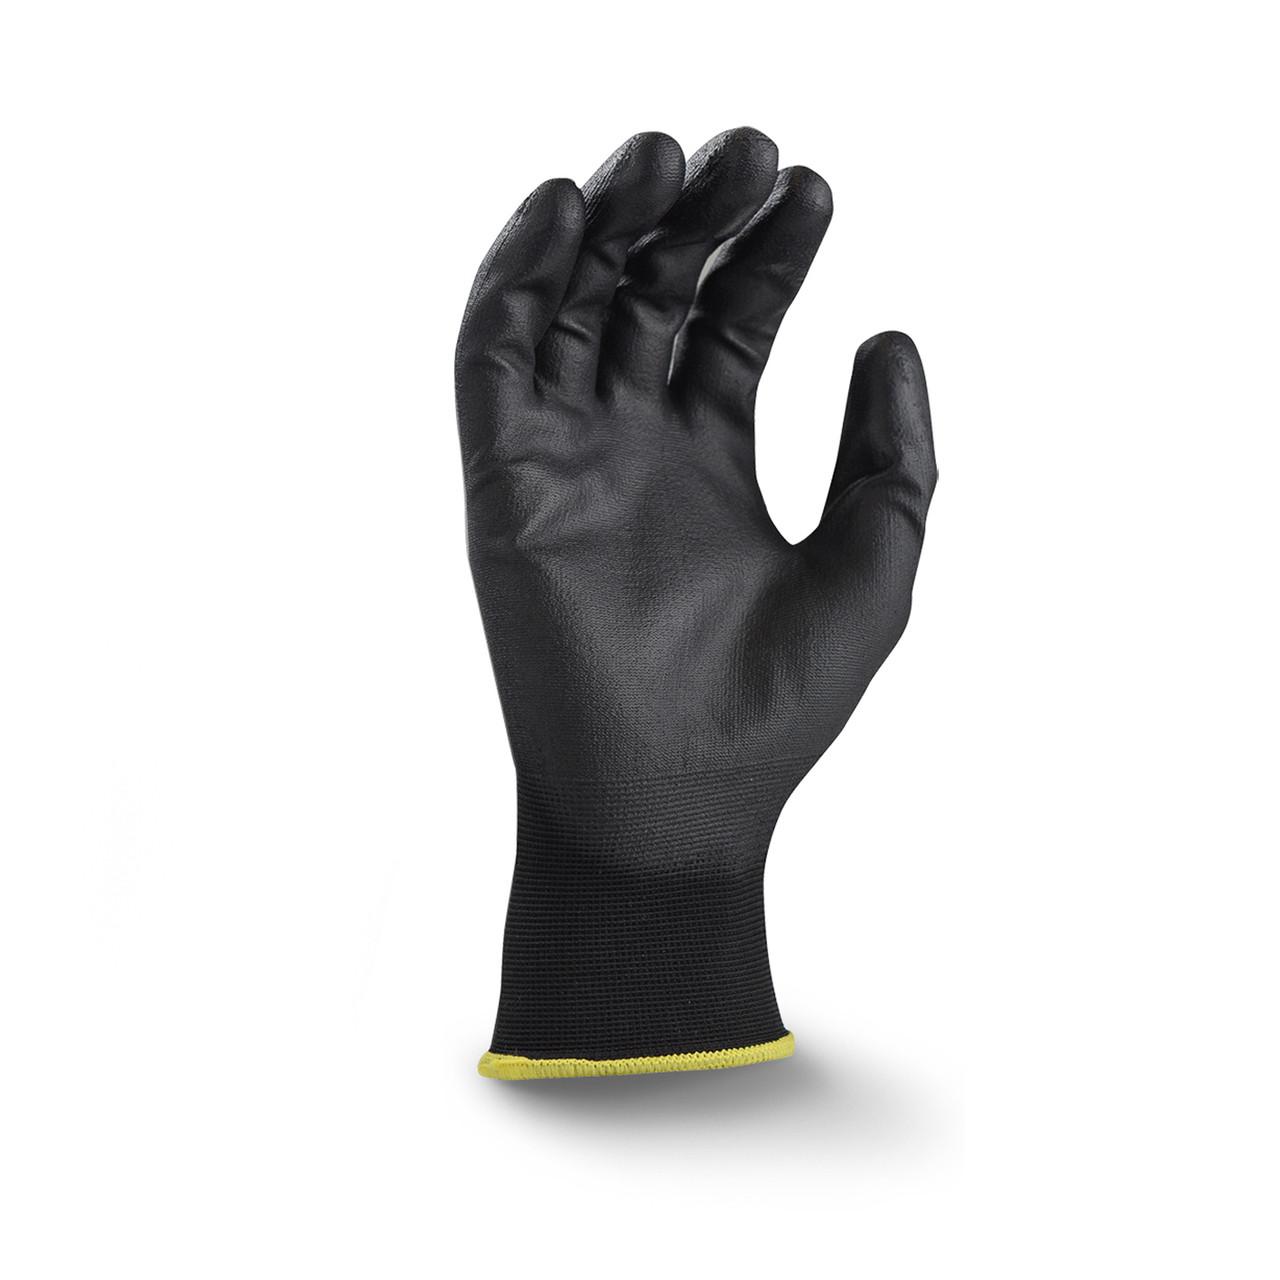 Touchscreen PU Palm Coated Glove